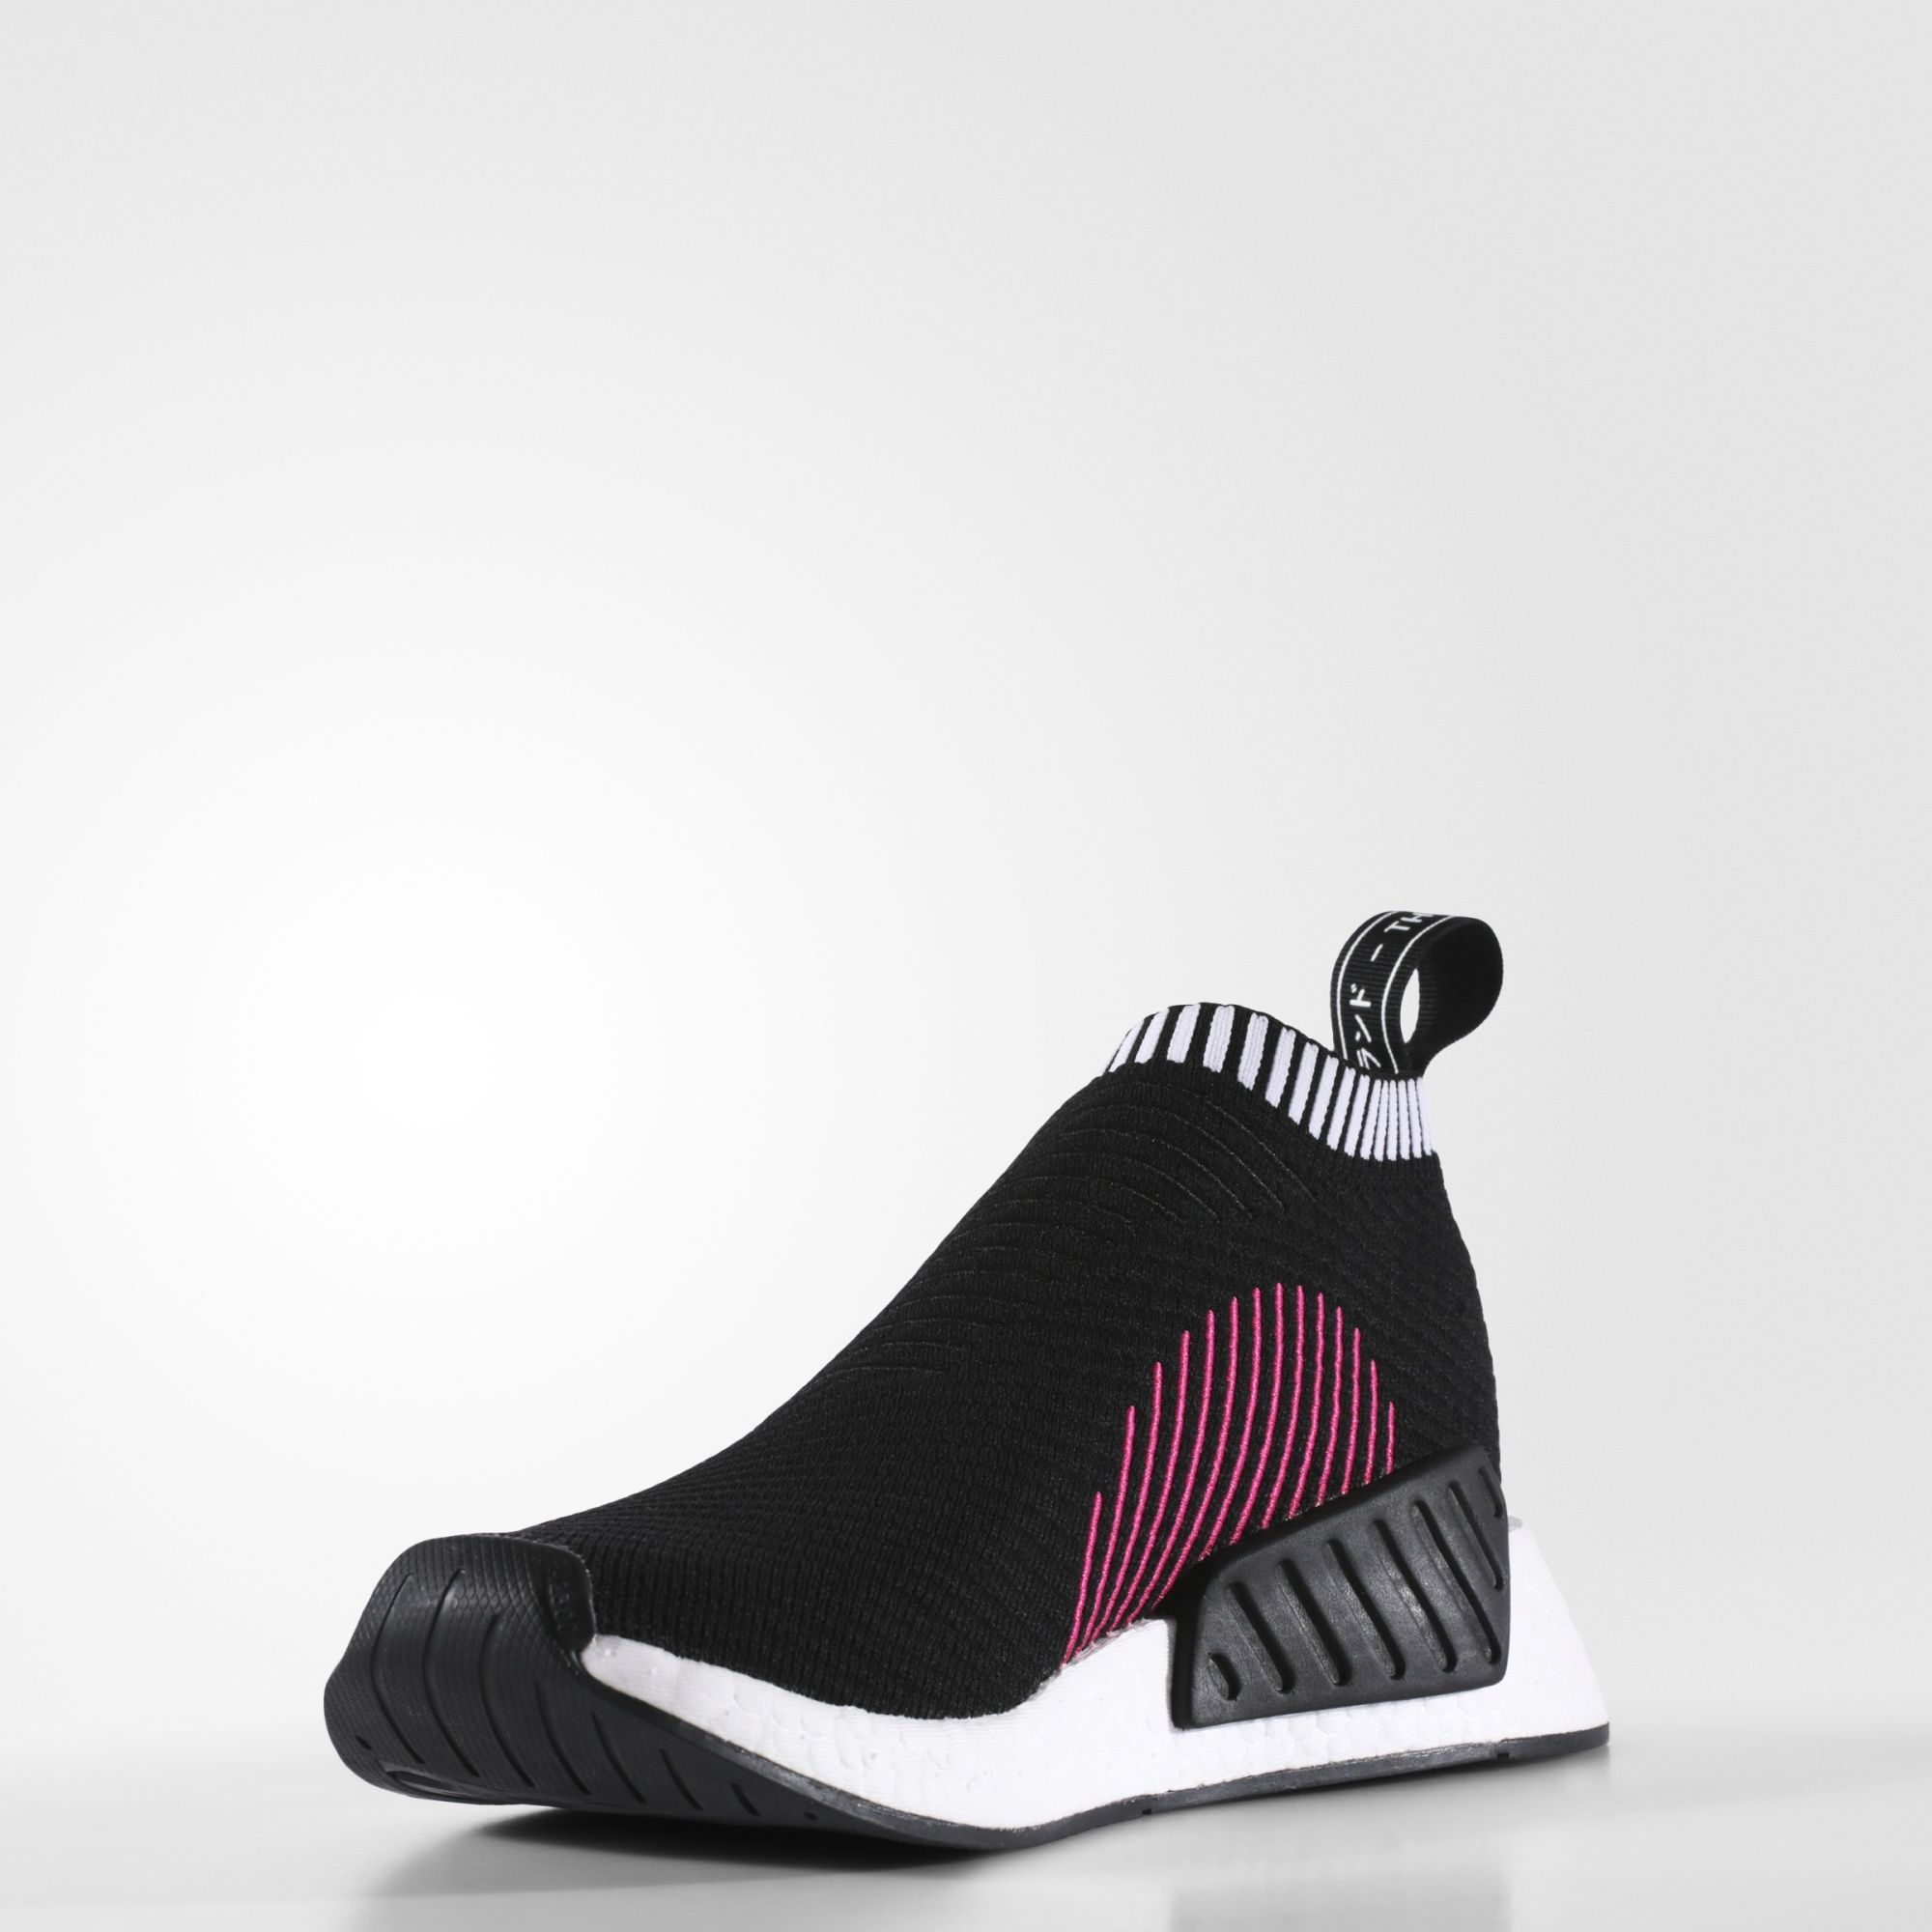 adidas - Men's NMD_CS2 Primeknit Shoes